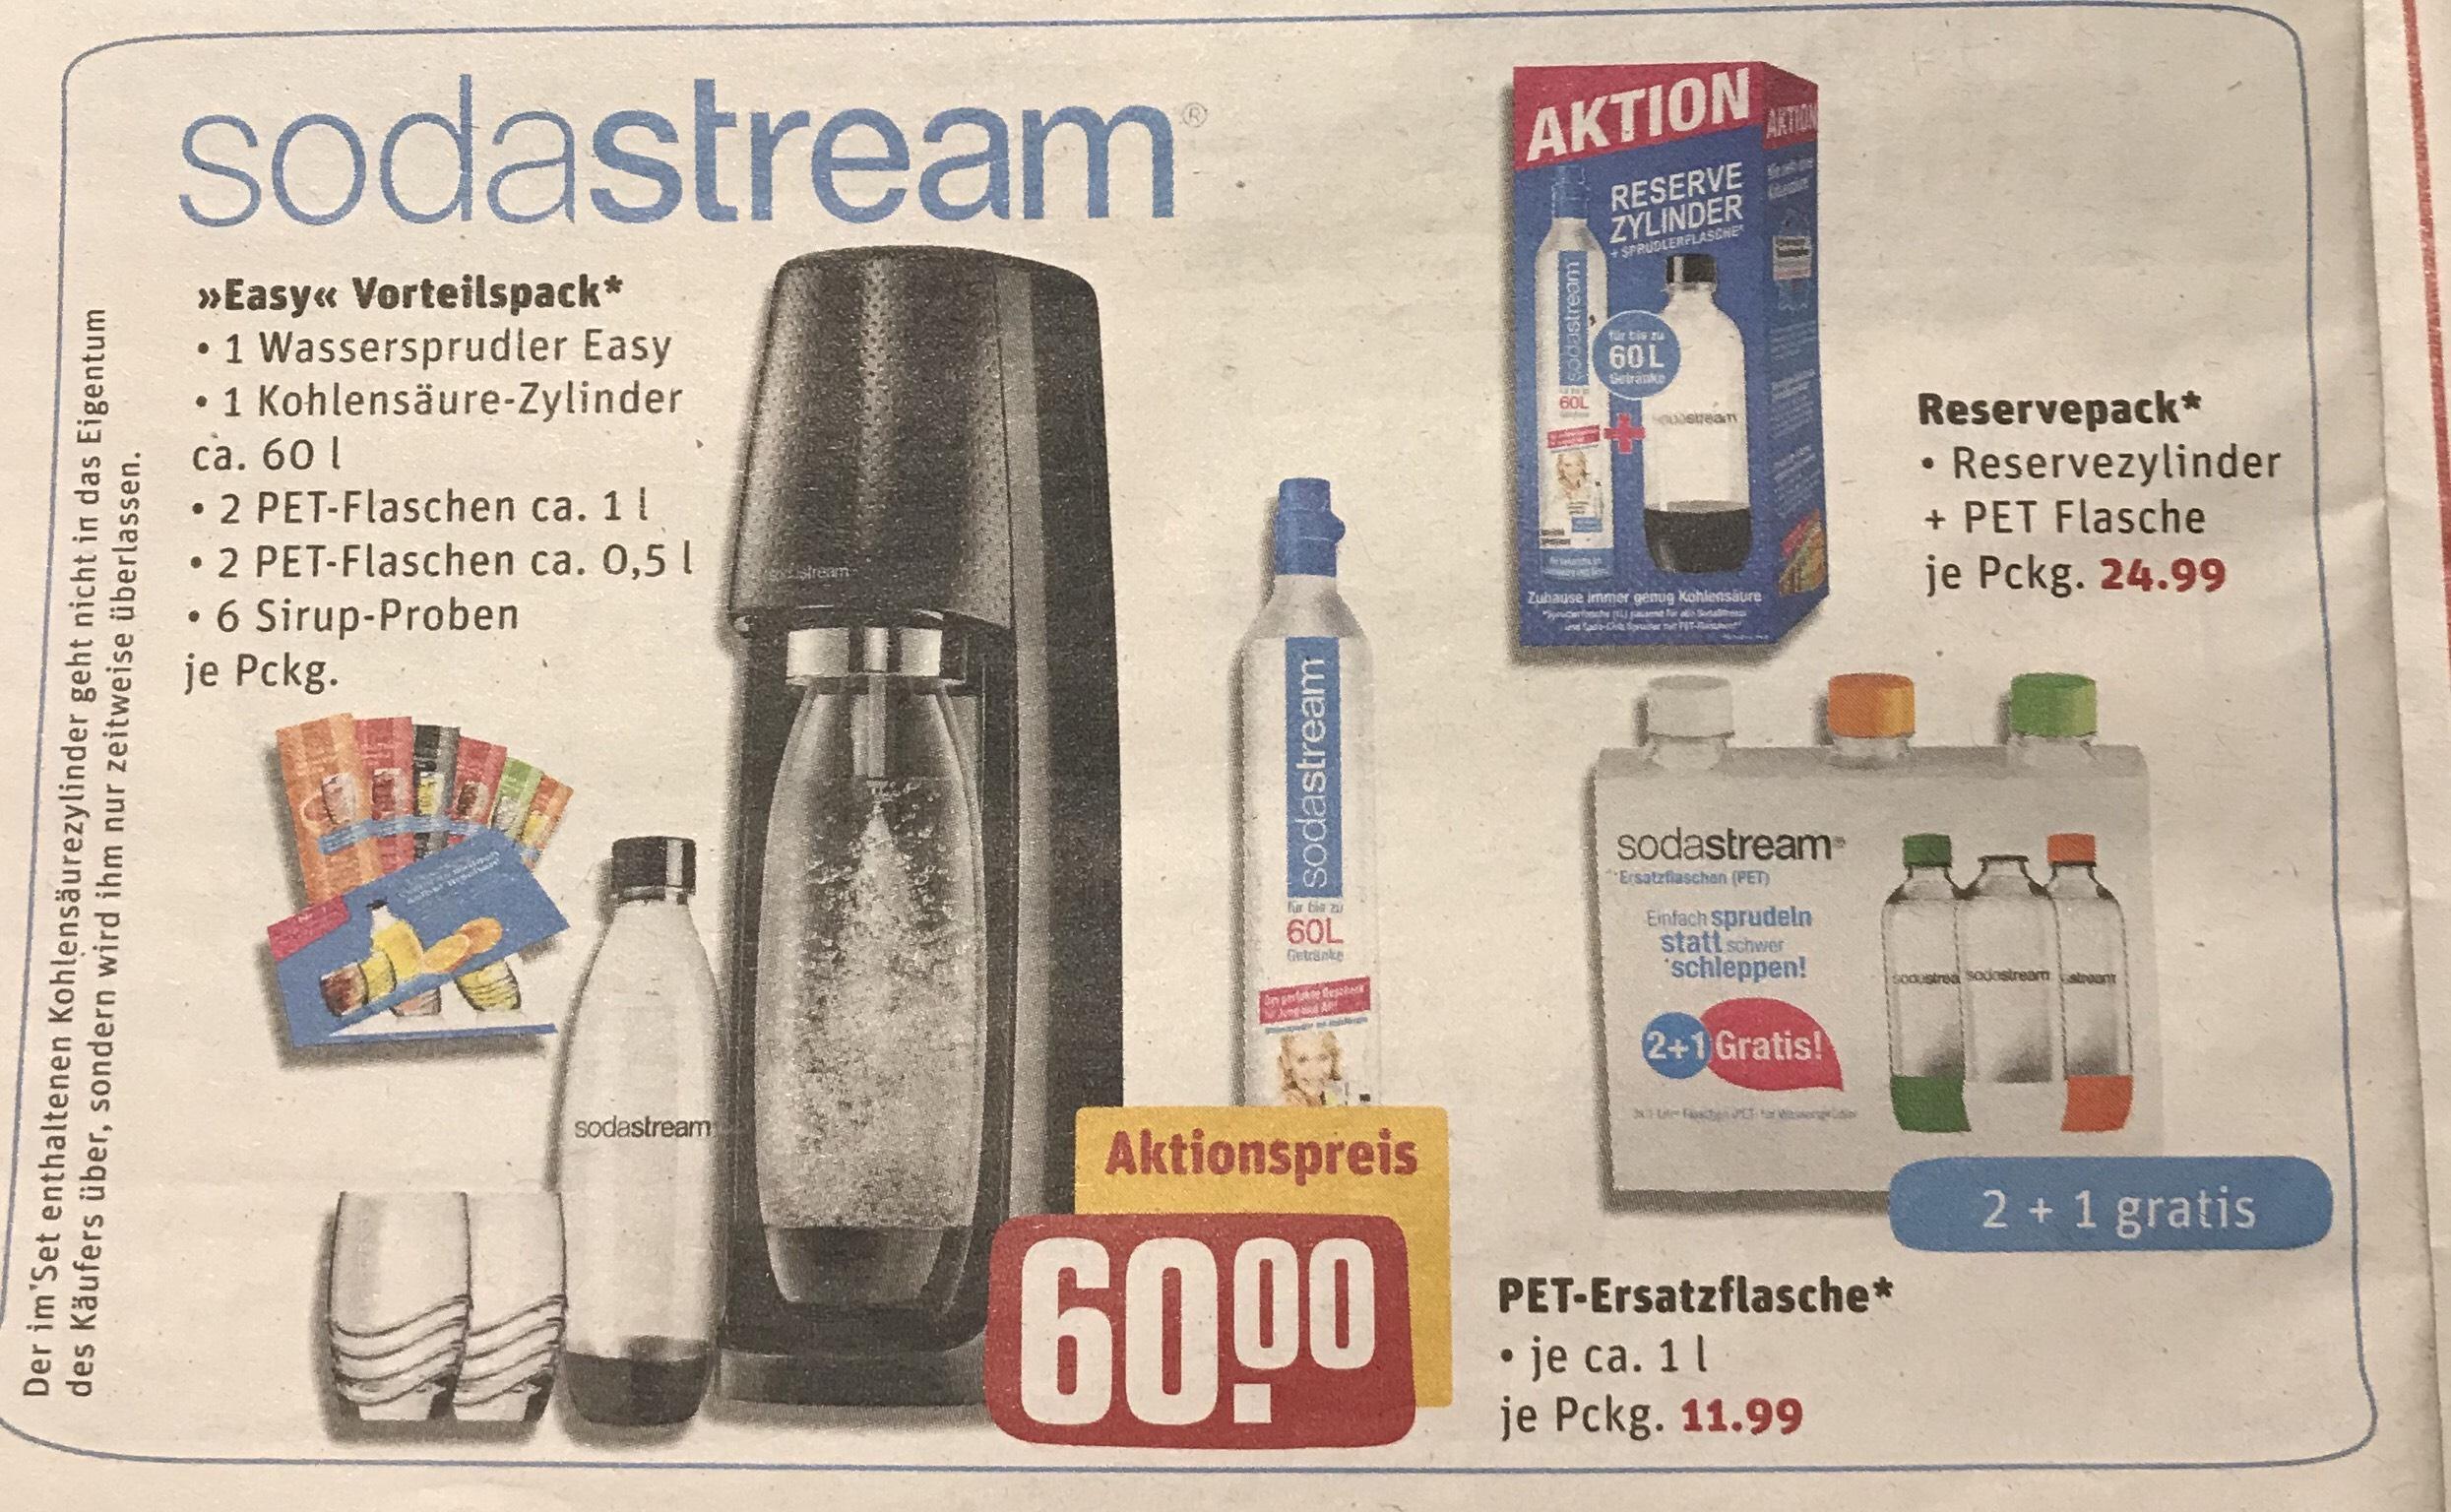 Sodastream Reservepack mit PET Flasche REWE